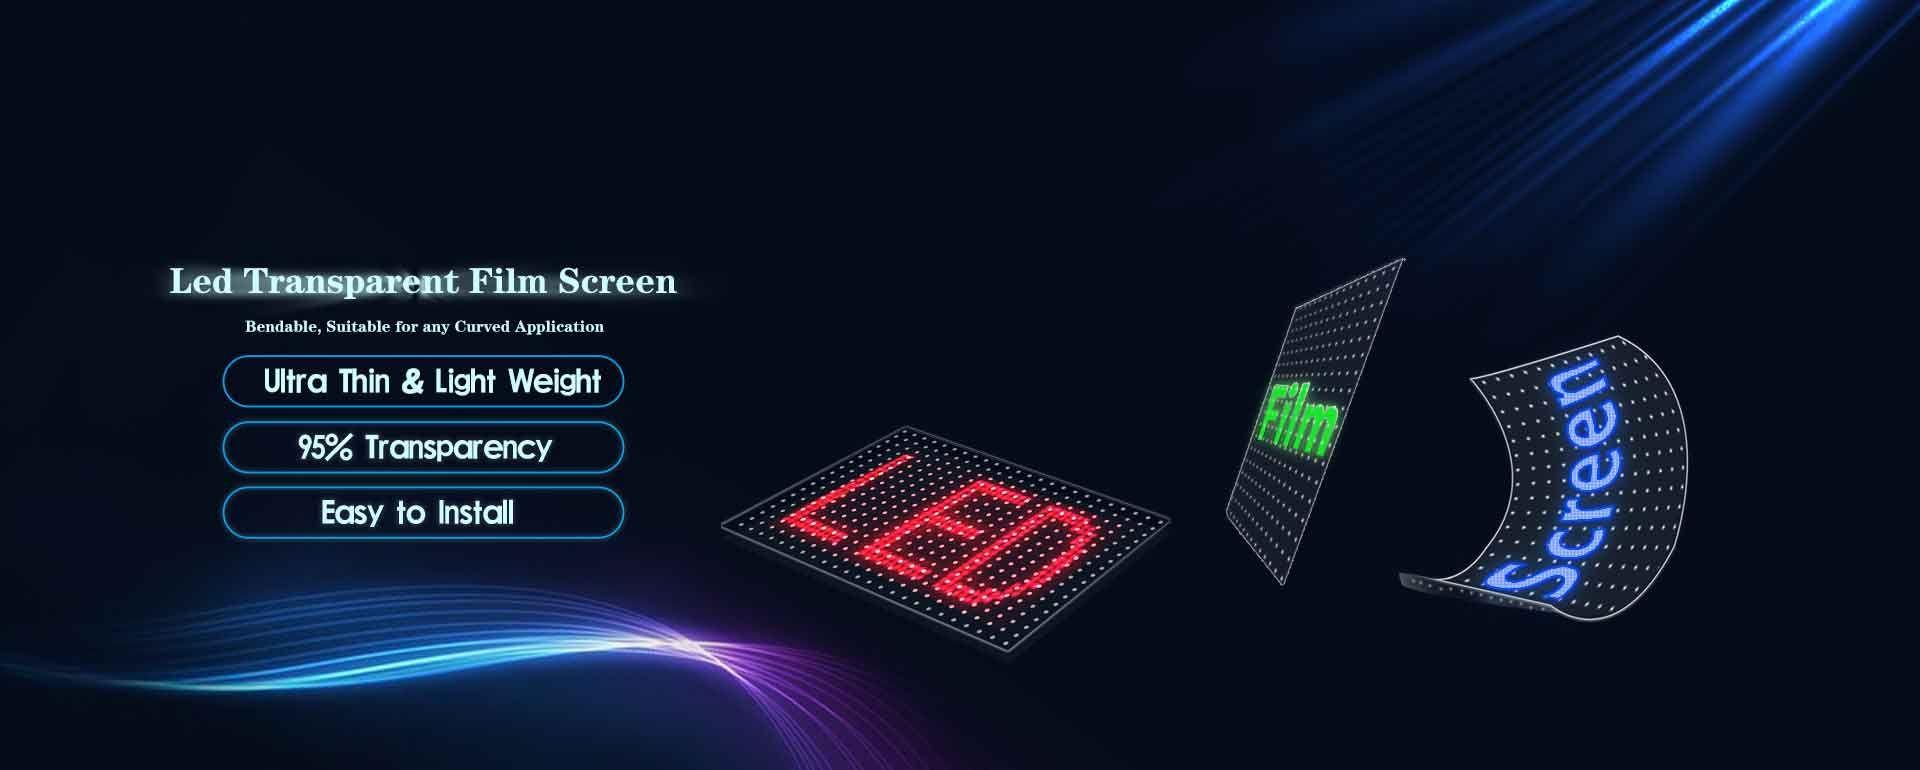 Transparent Led Film Screen